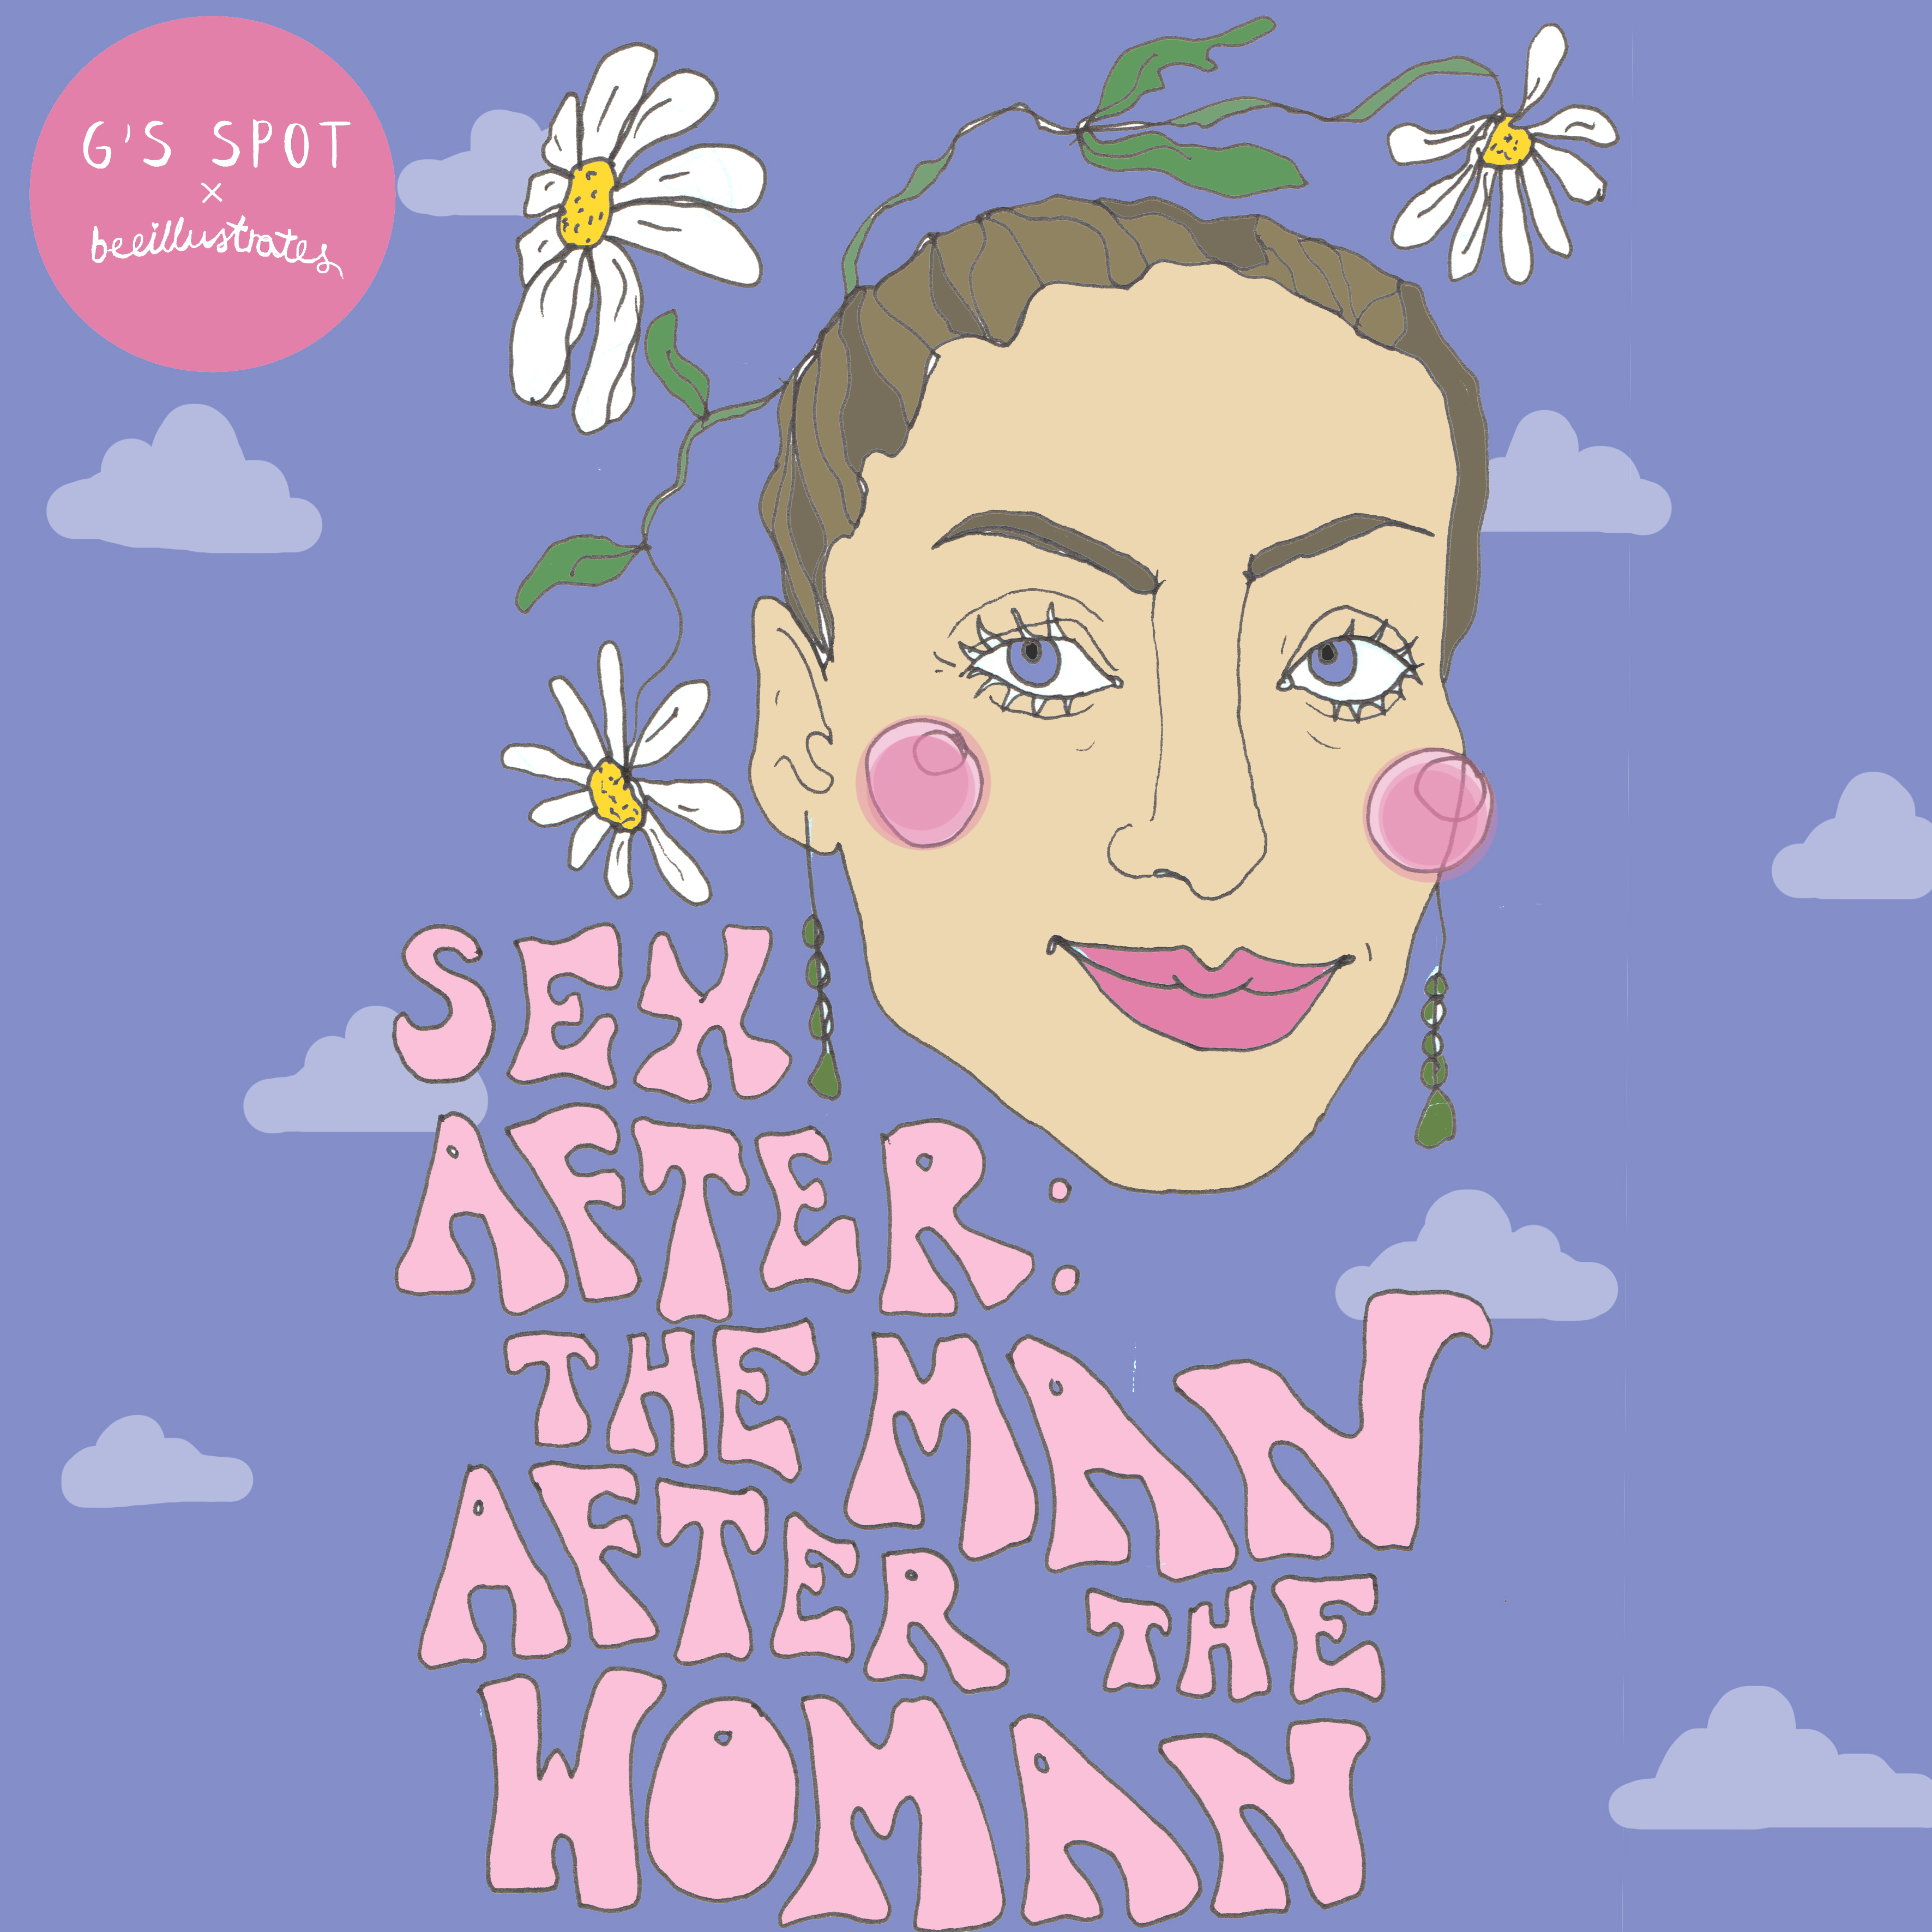 Sonja Semion on heterosexual sex after lesbian sex